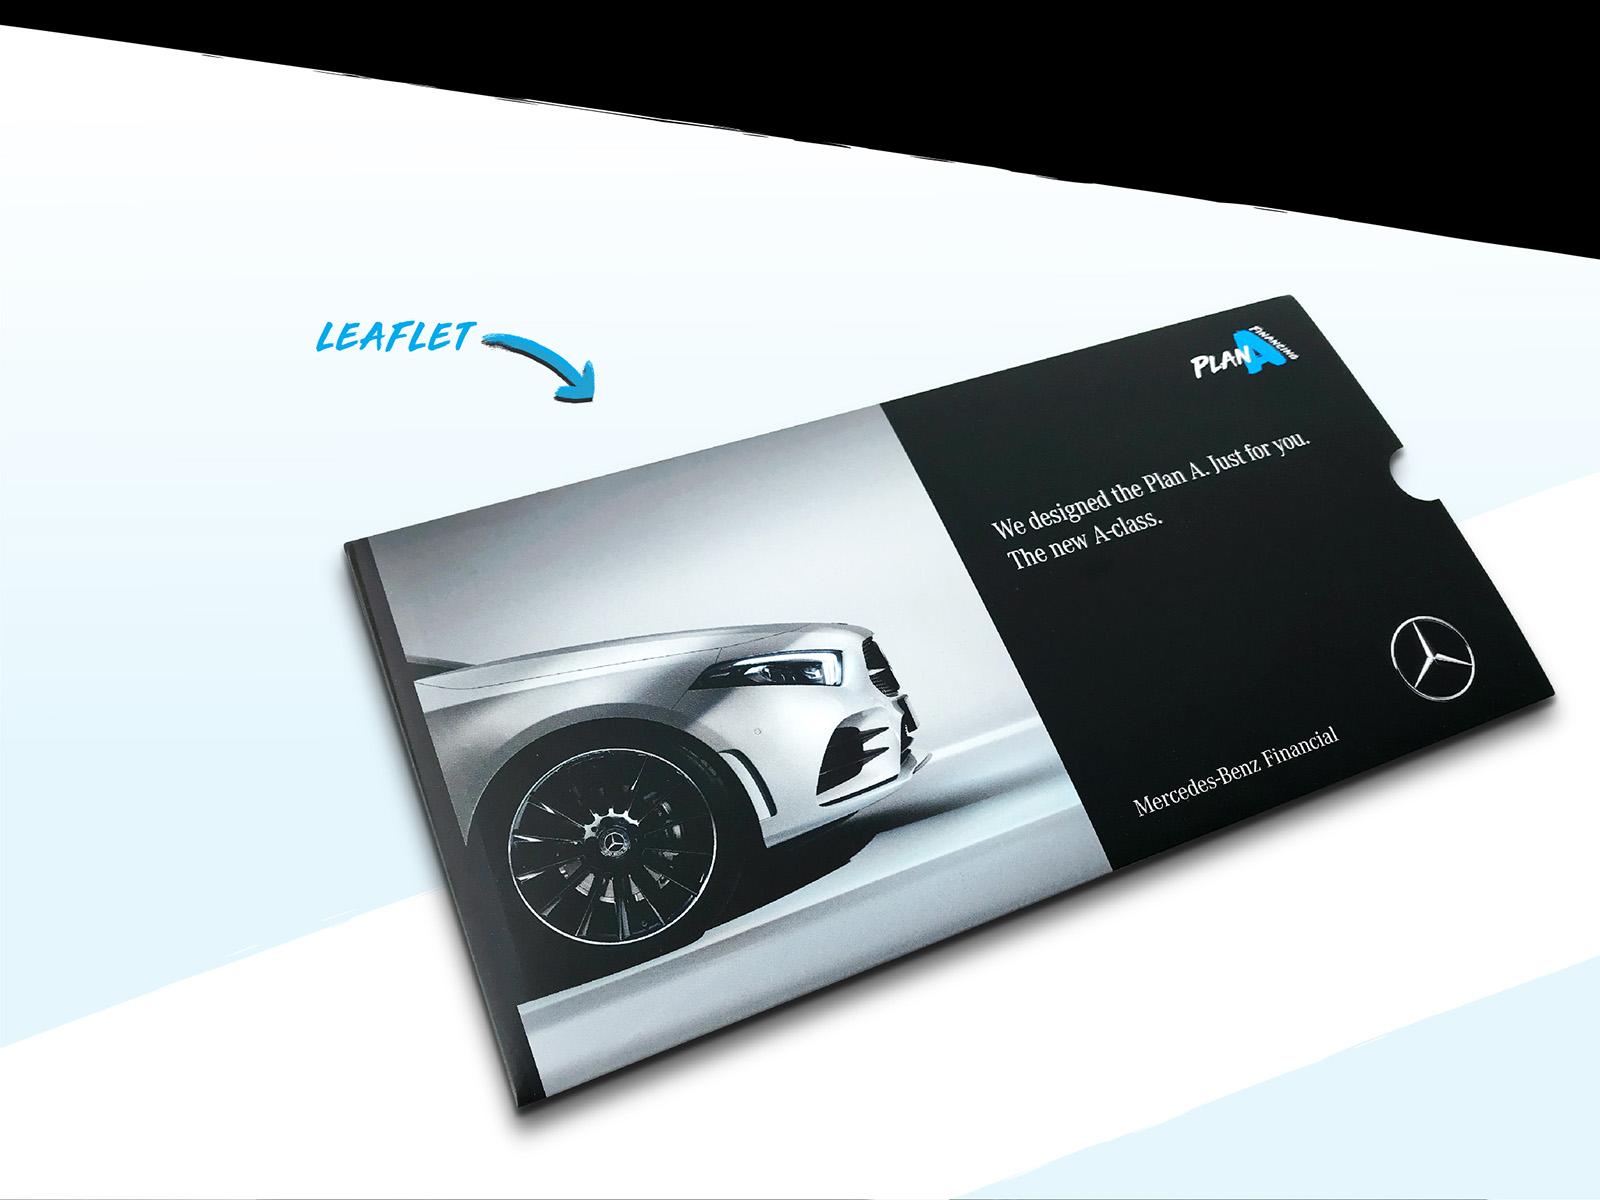 Mercedes-Benz Plan A financing plan masthead design applied onto the latest A class car leaflet